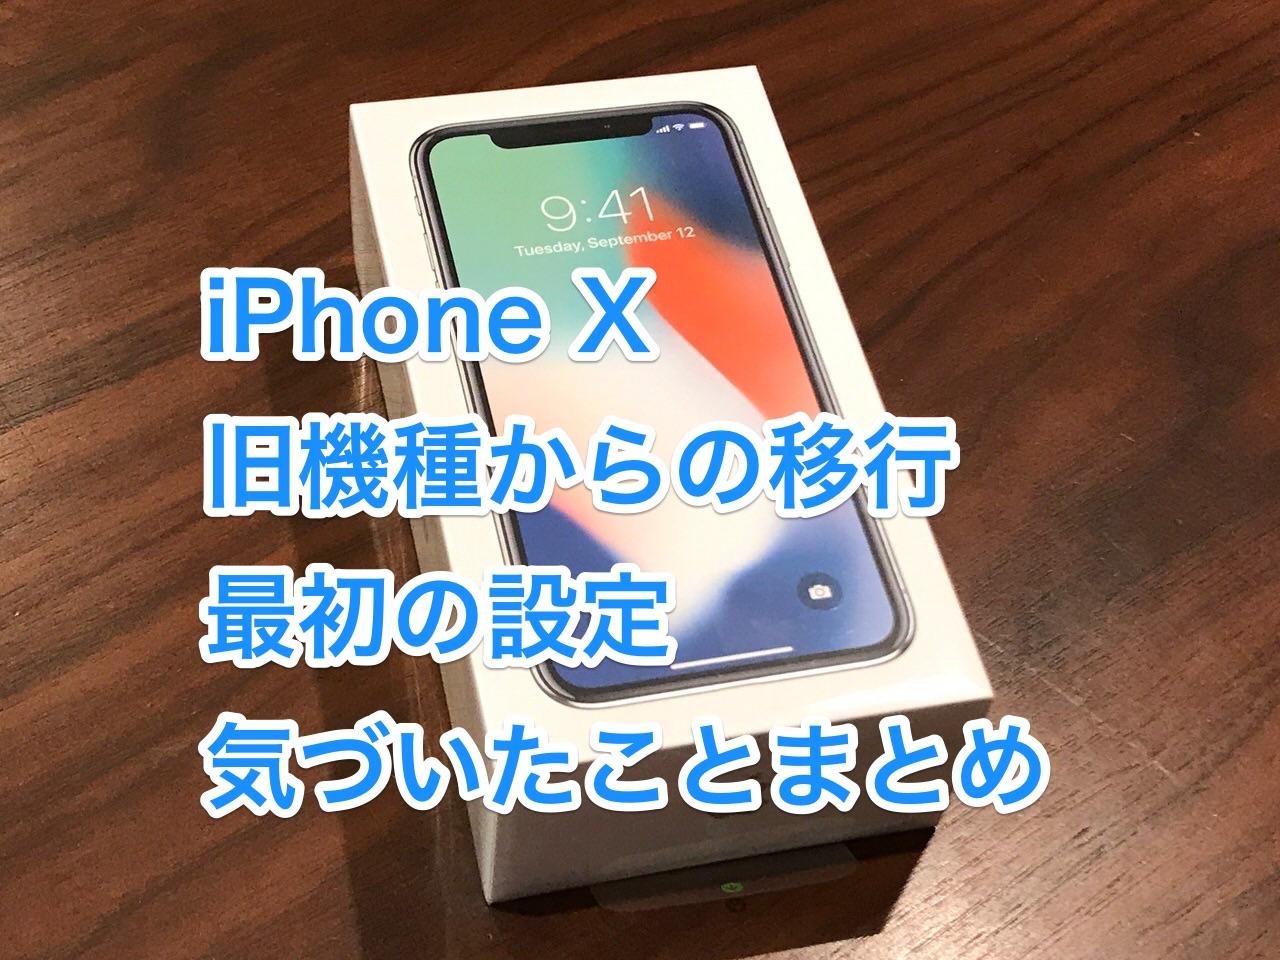 【iPhone X】移行・設定・注意・感想・まとめ